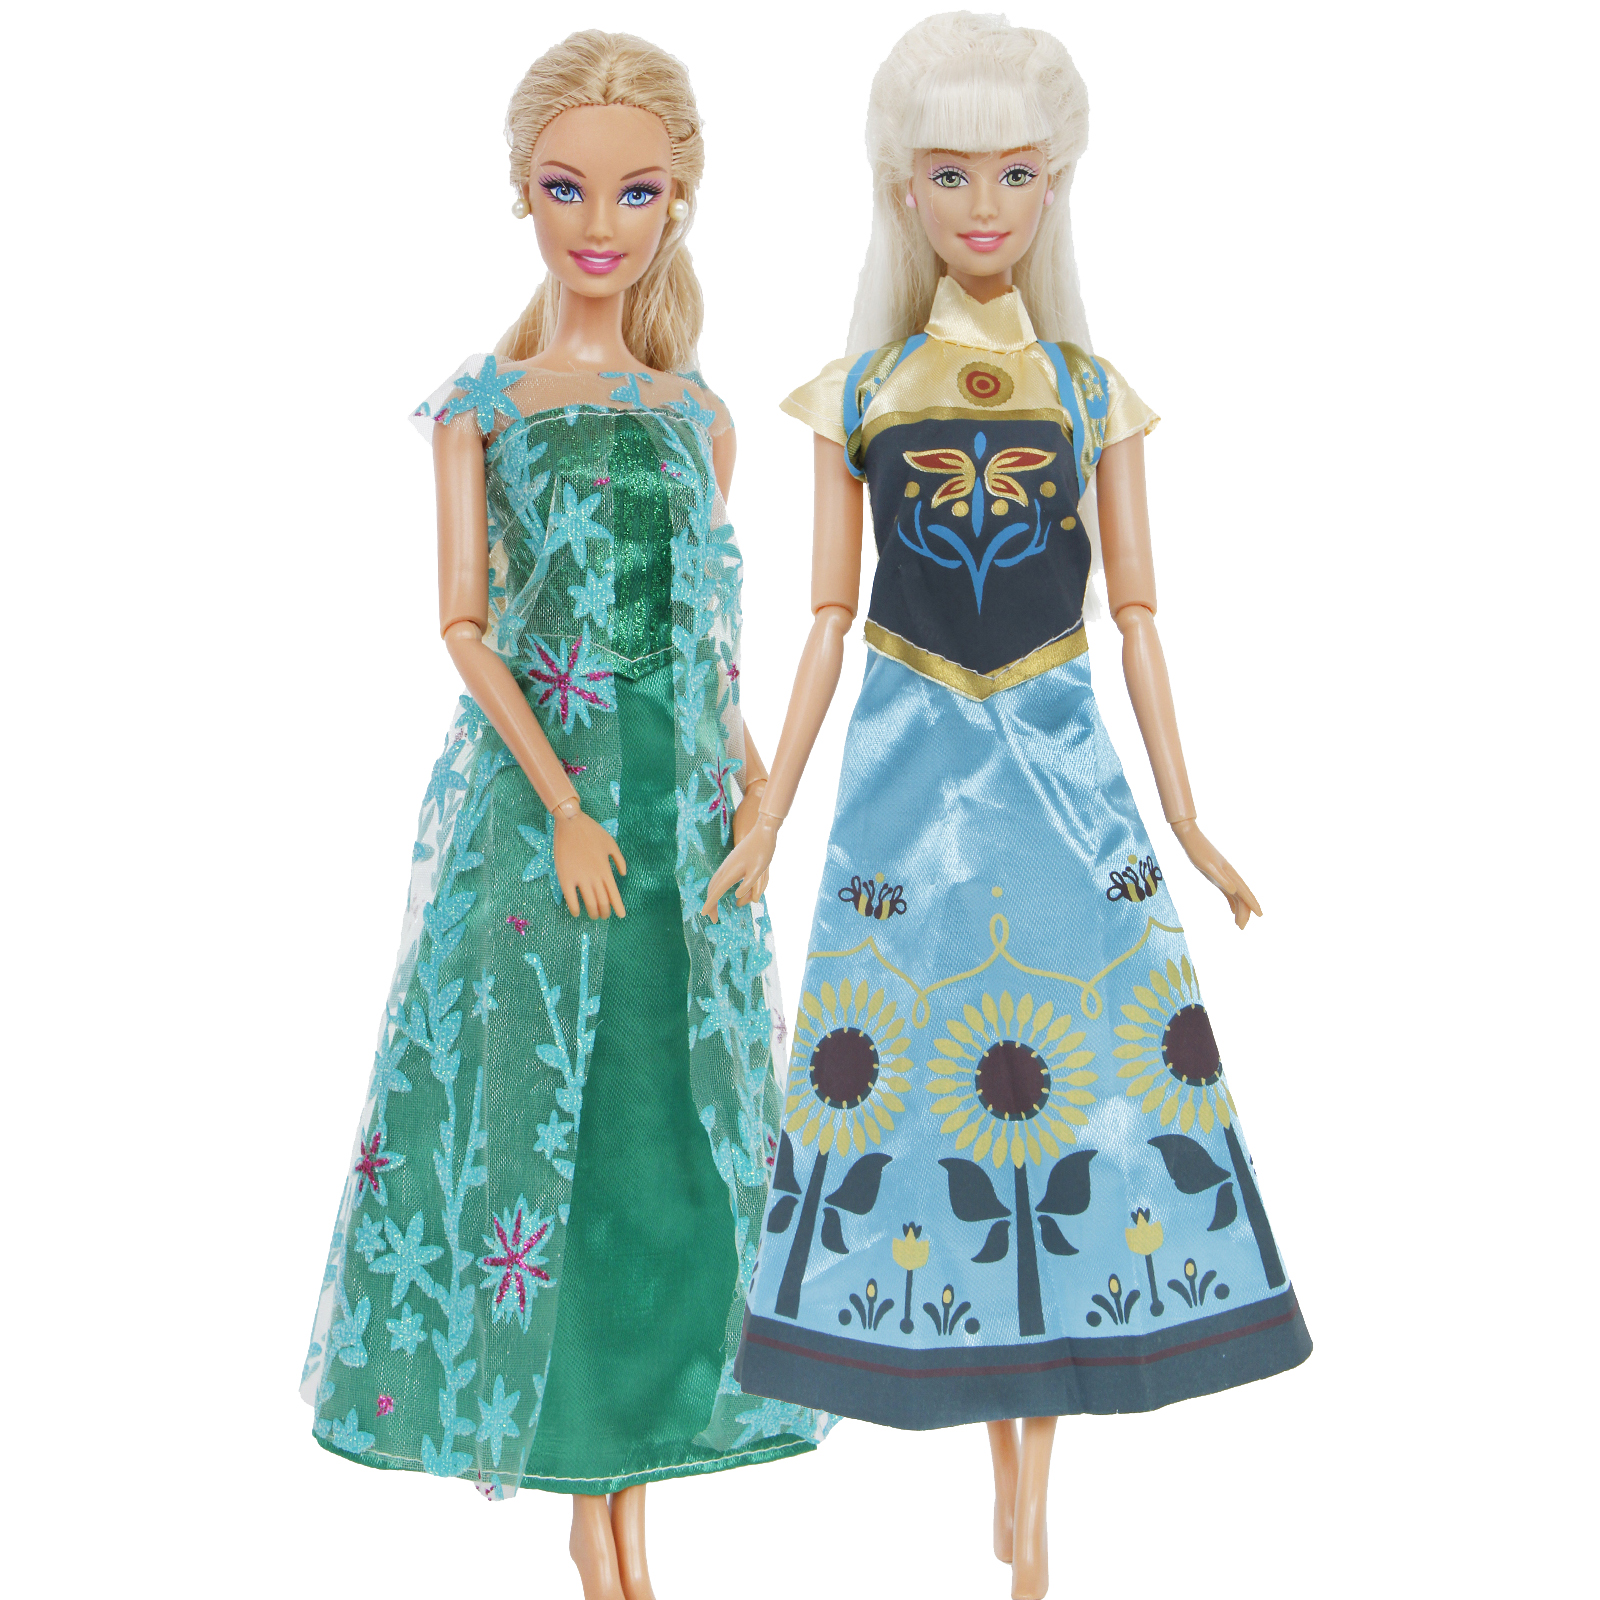 2 Pcs / Set Fairy Tale Princess Dress Elsa+ Anna Wedding Party Wear Twins Clothes For Barbie Doll Accessories 12'' Kids Toy